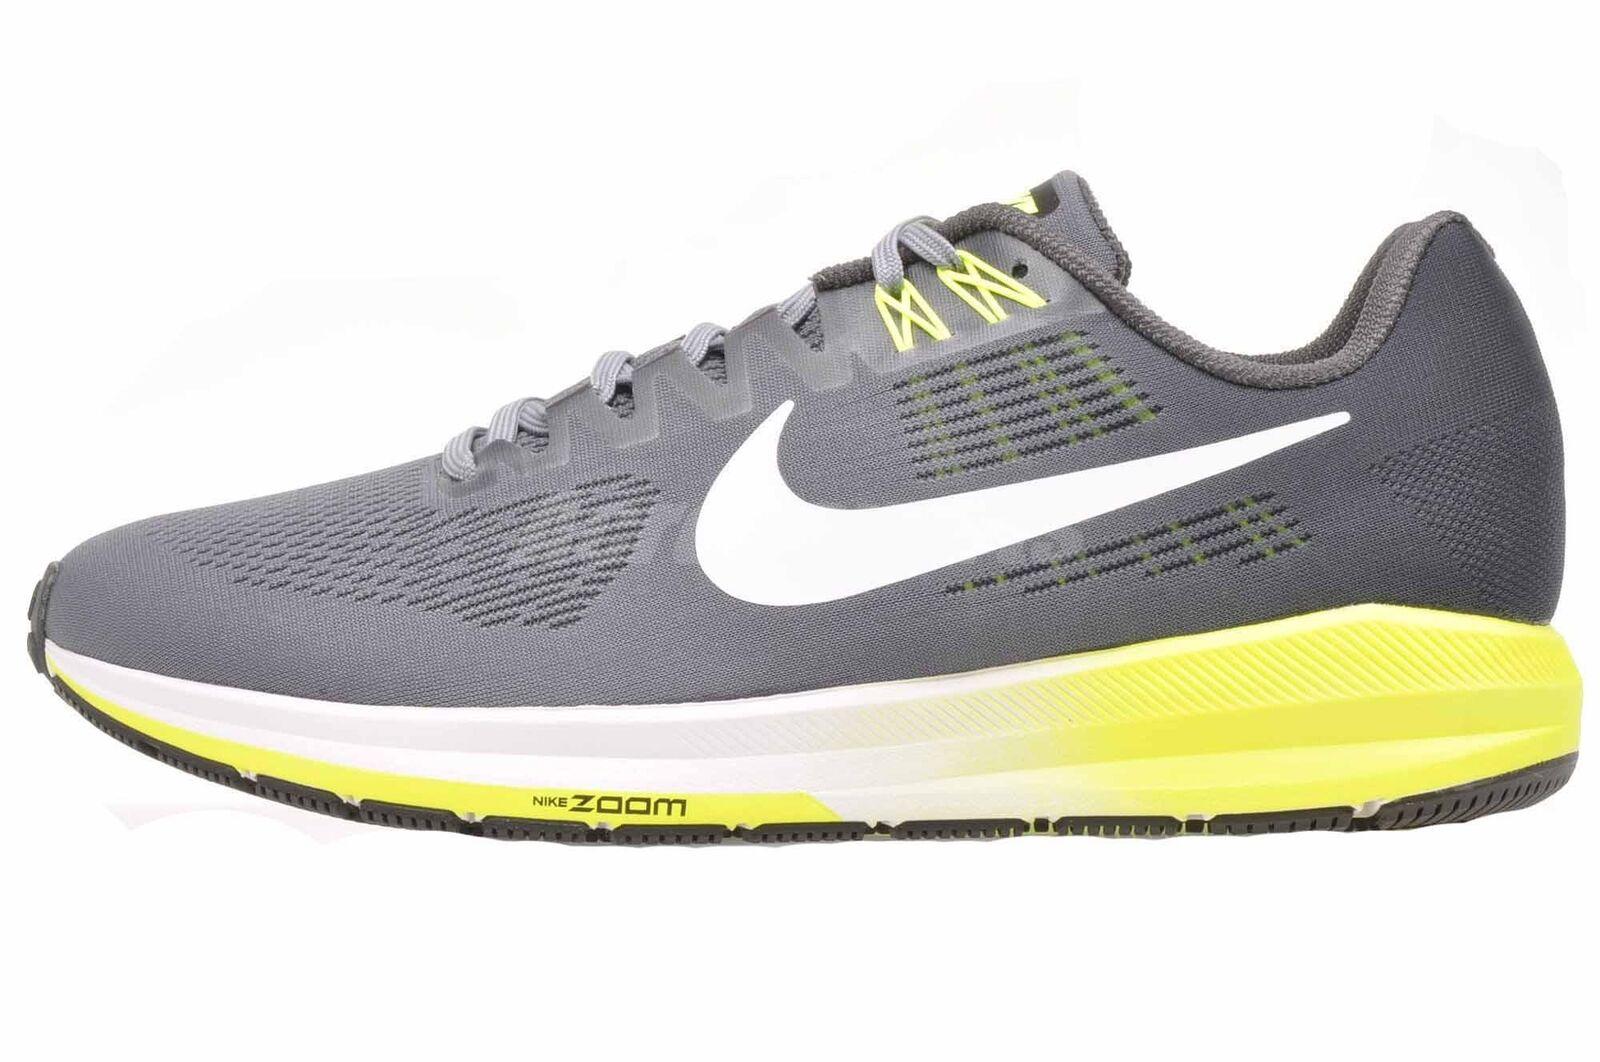 Nike Air Zoom Struktur 21 4E Wide Laufen Herren Laufen schuhe grau 904697-007